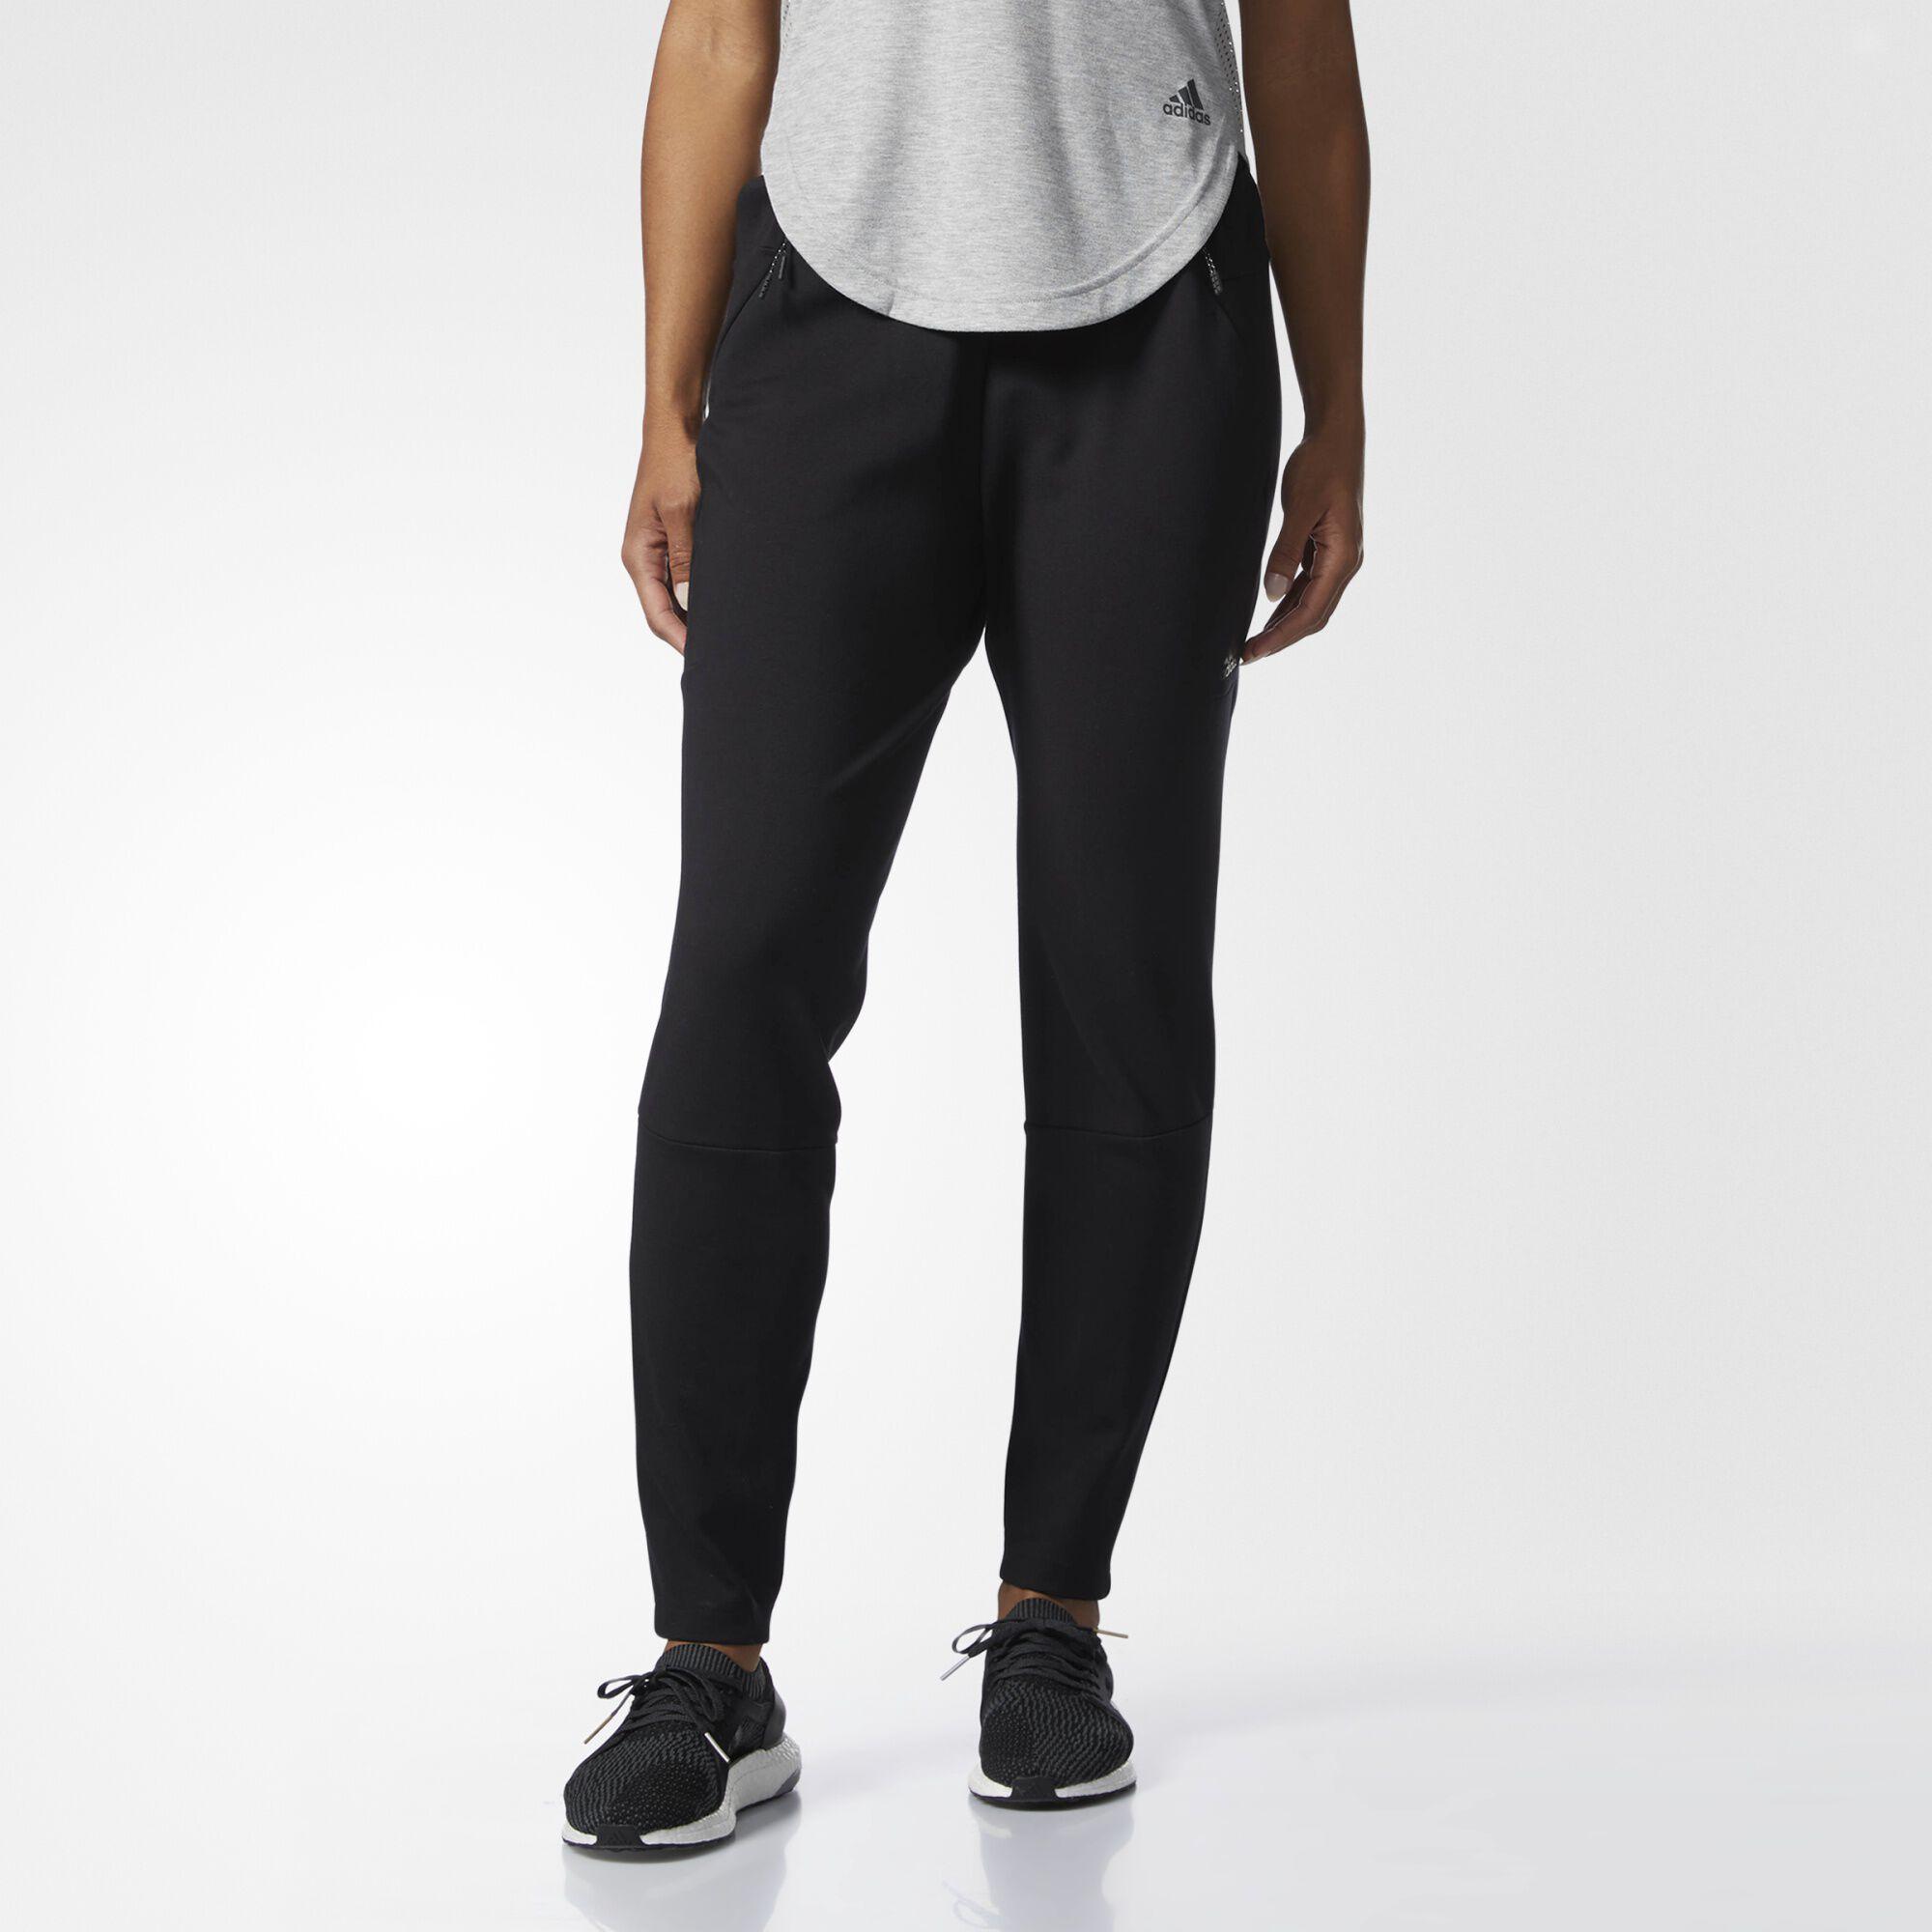 adidas running apparel sale